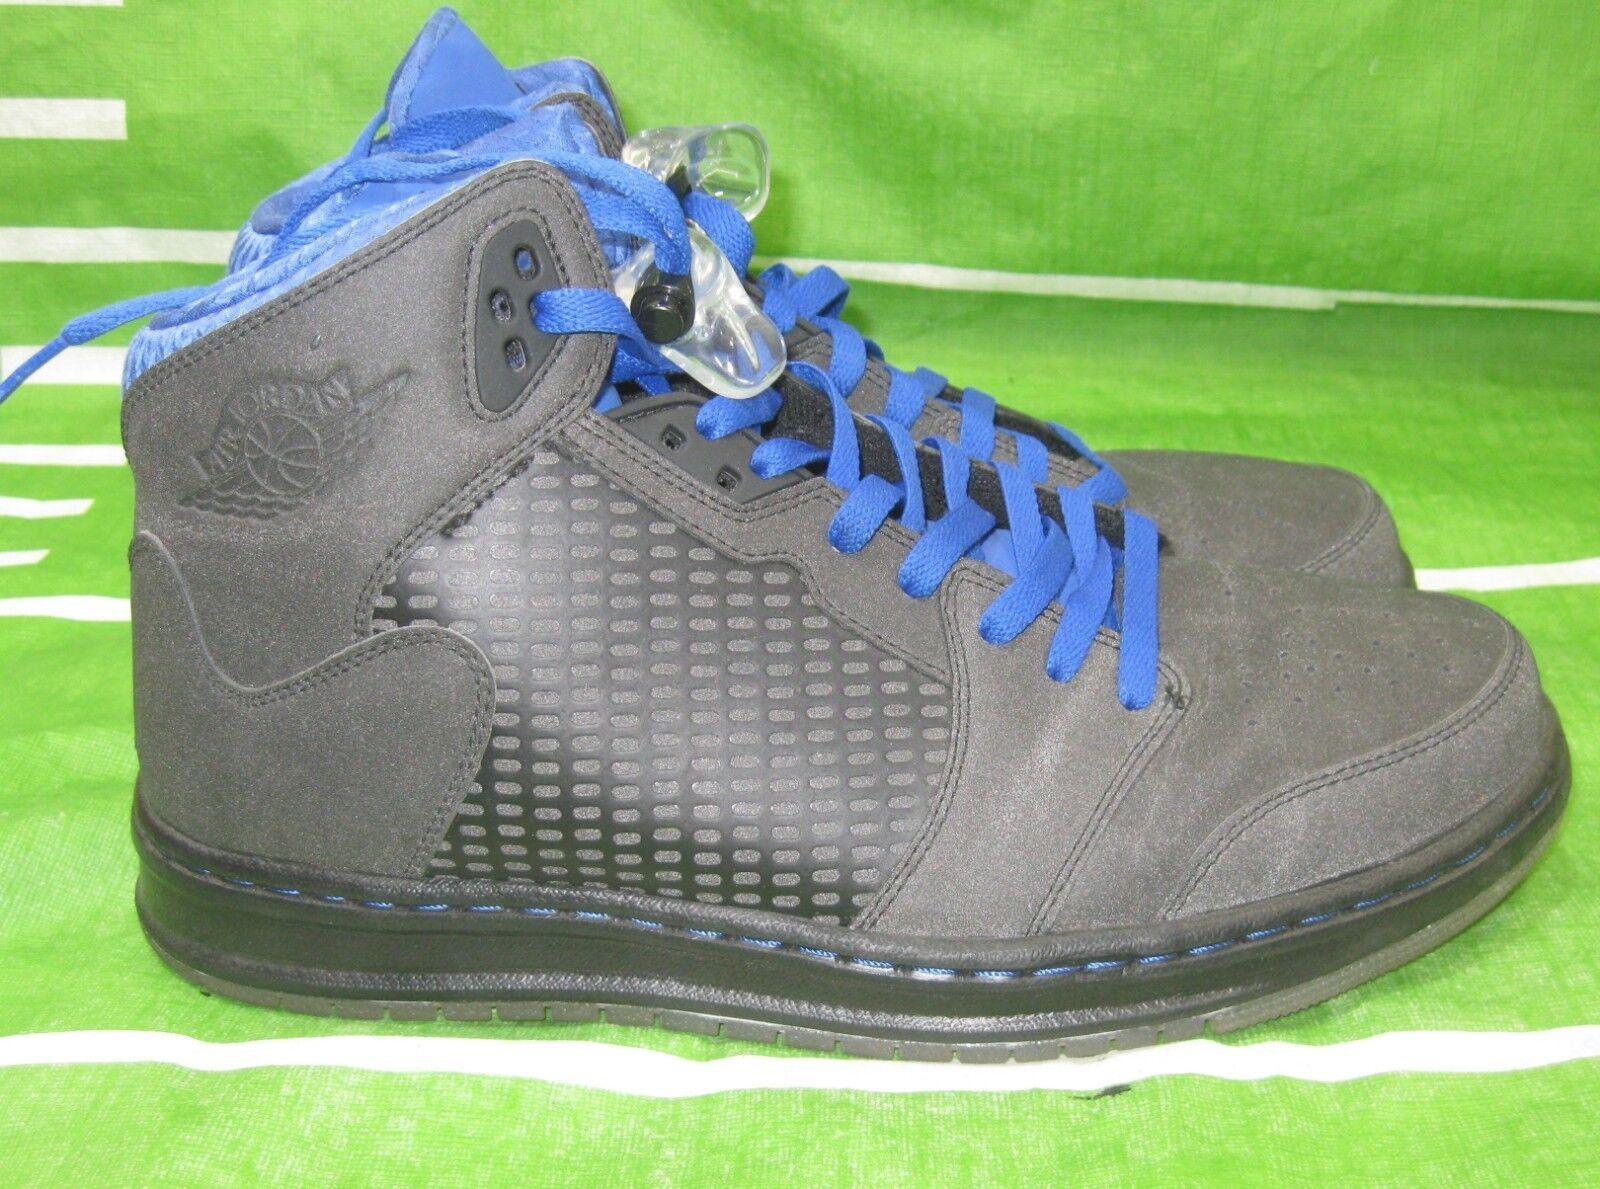 Nike Air Jordan Prime 5 Black varsity Royal High Top  429489-017 Size 10.5